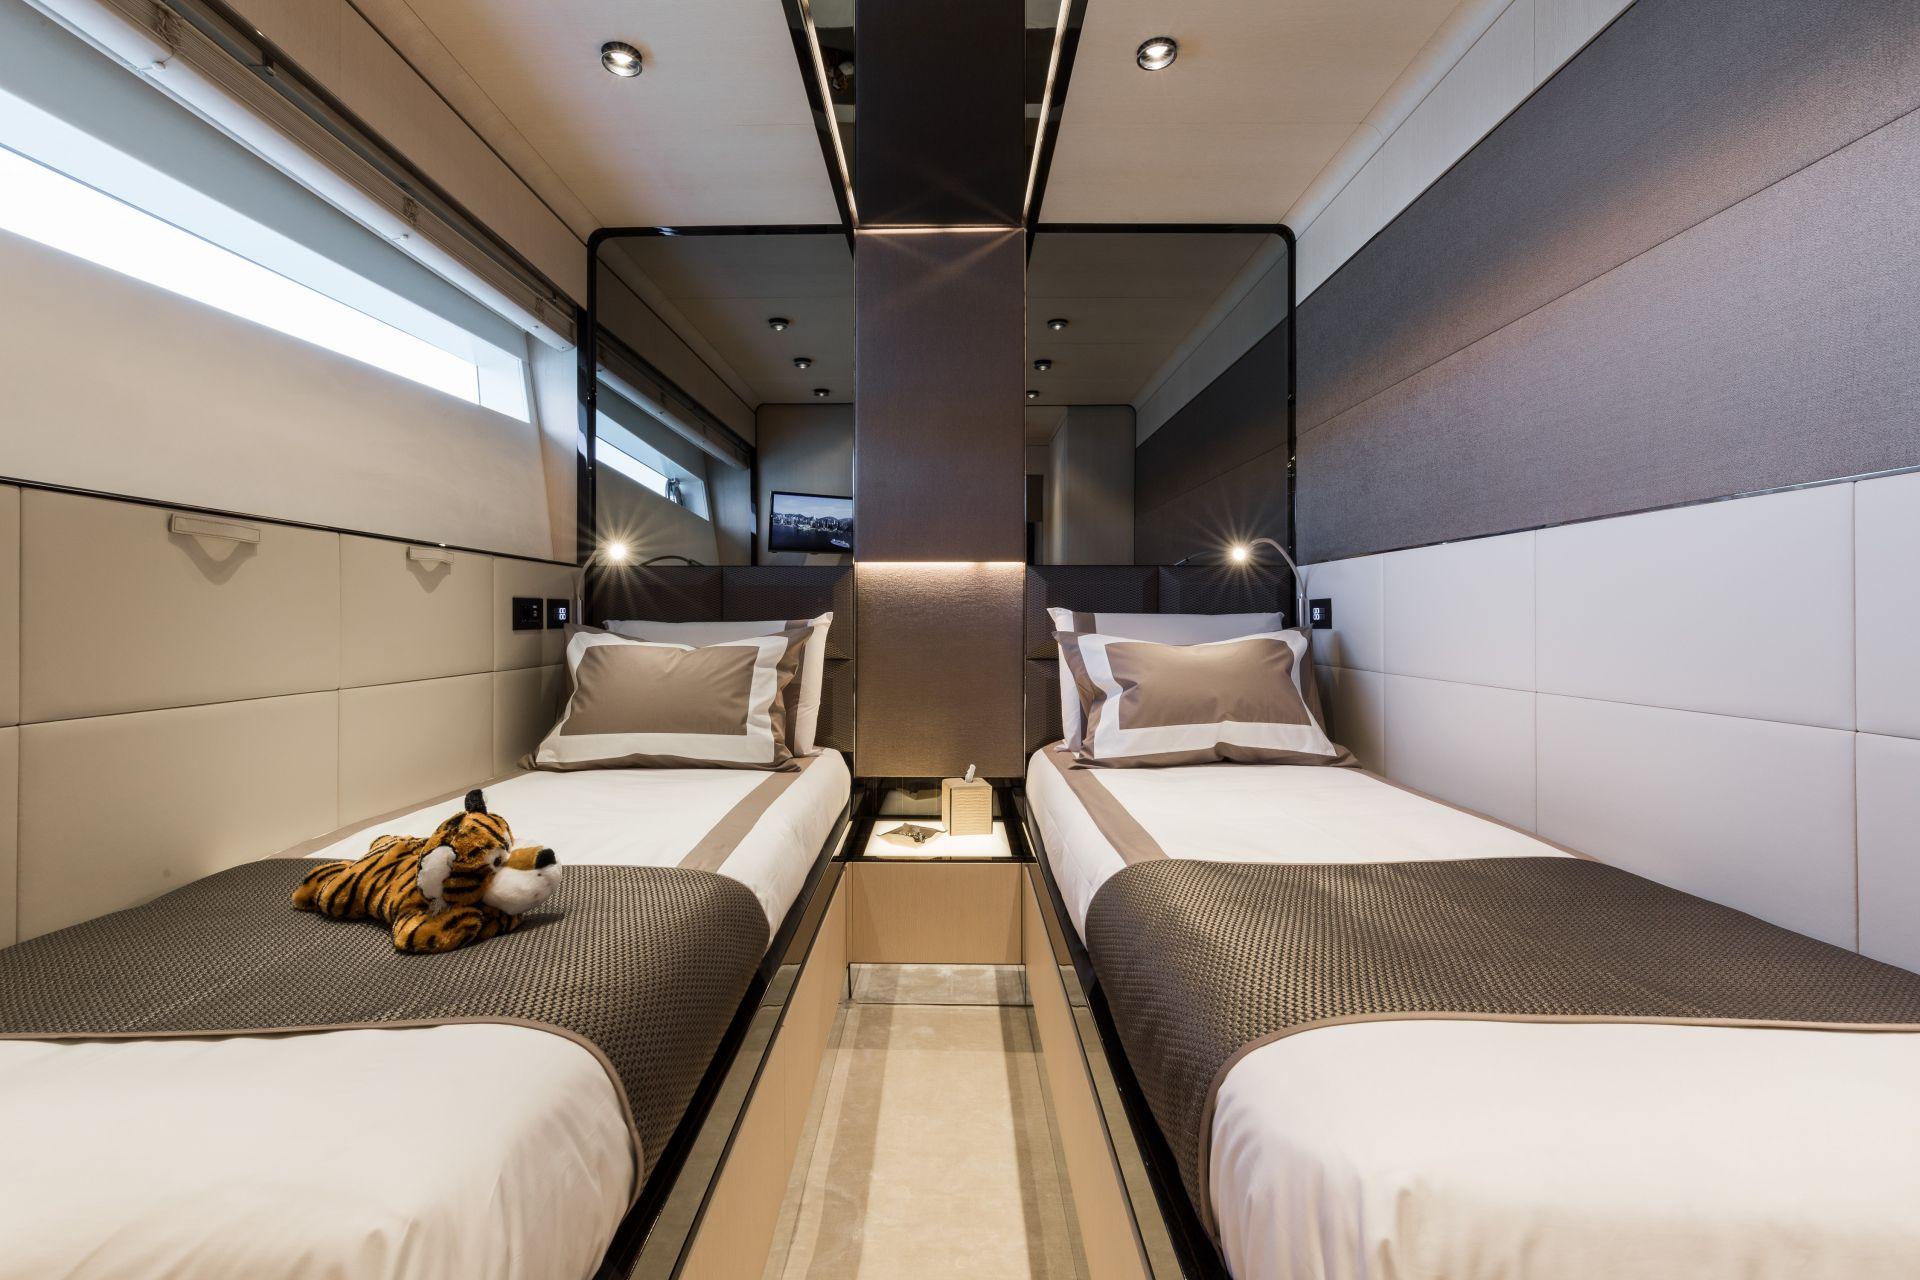 M/Y HANAA yacht for charter twin cabin